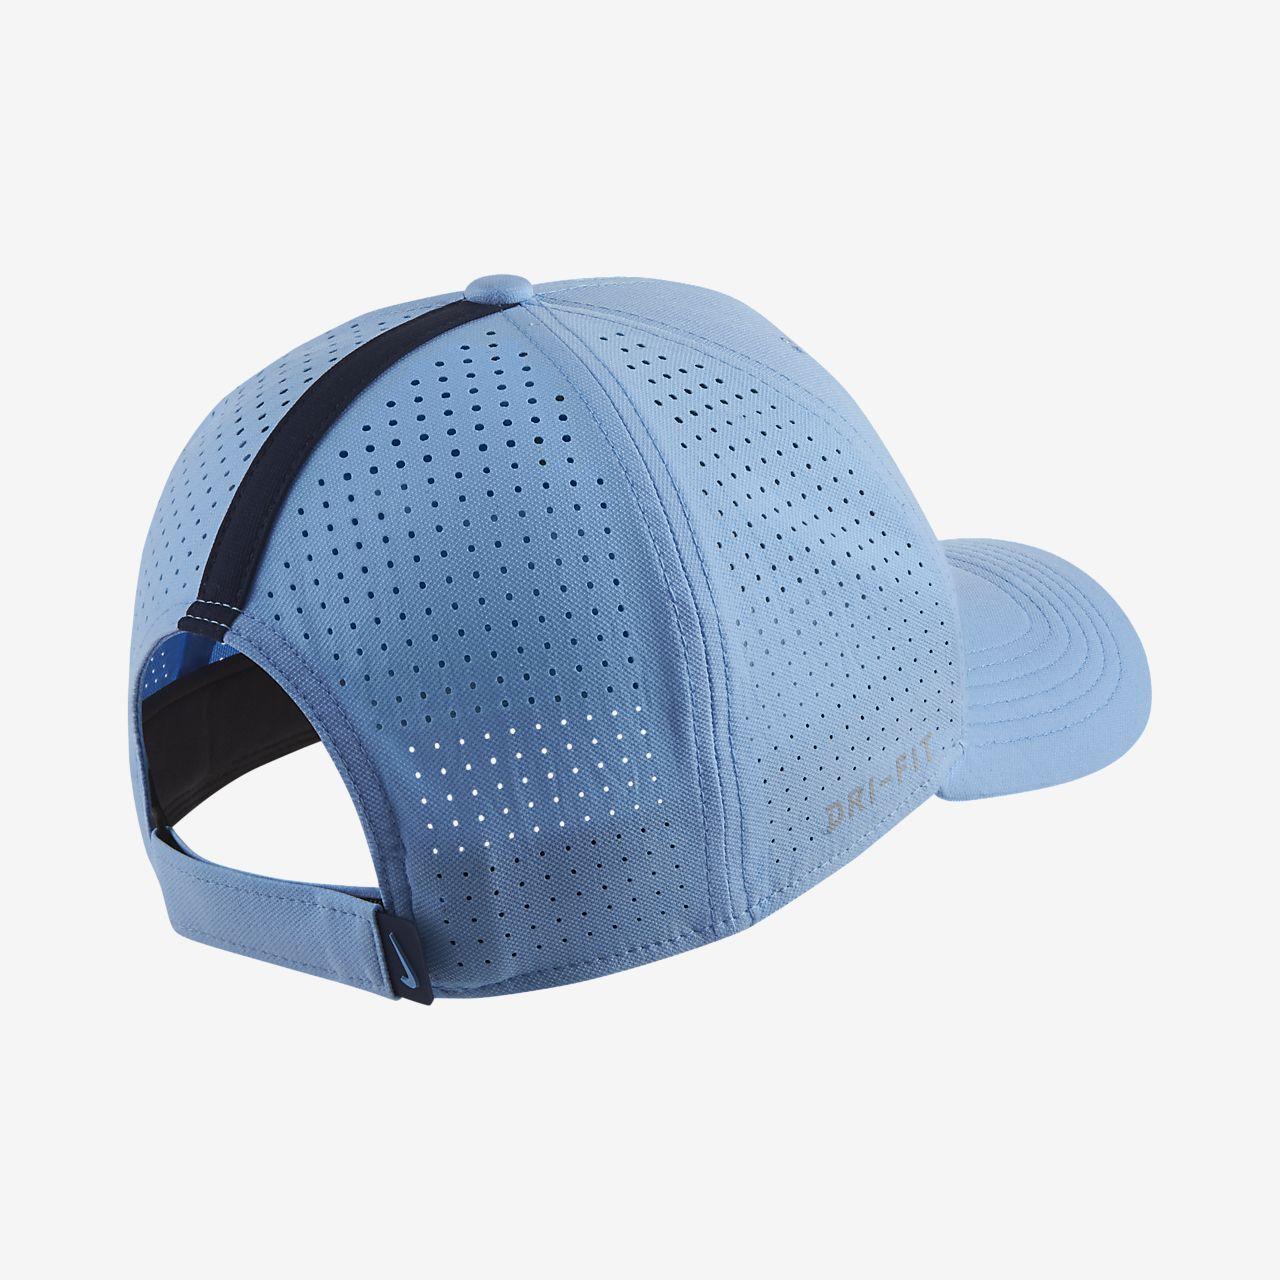 a5618f199 Manchester City FC AeroBill Classic99 Adjustable Hat. Nike.com CH